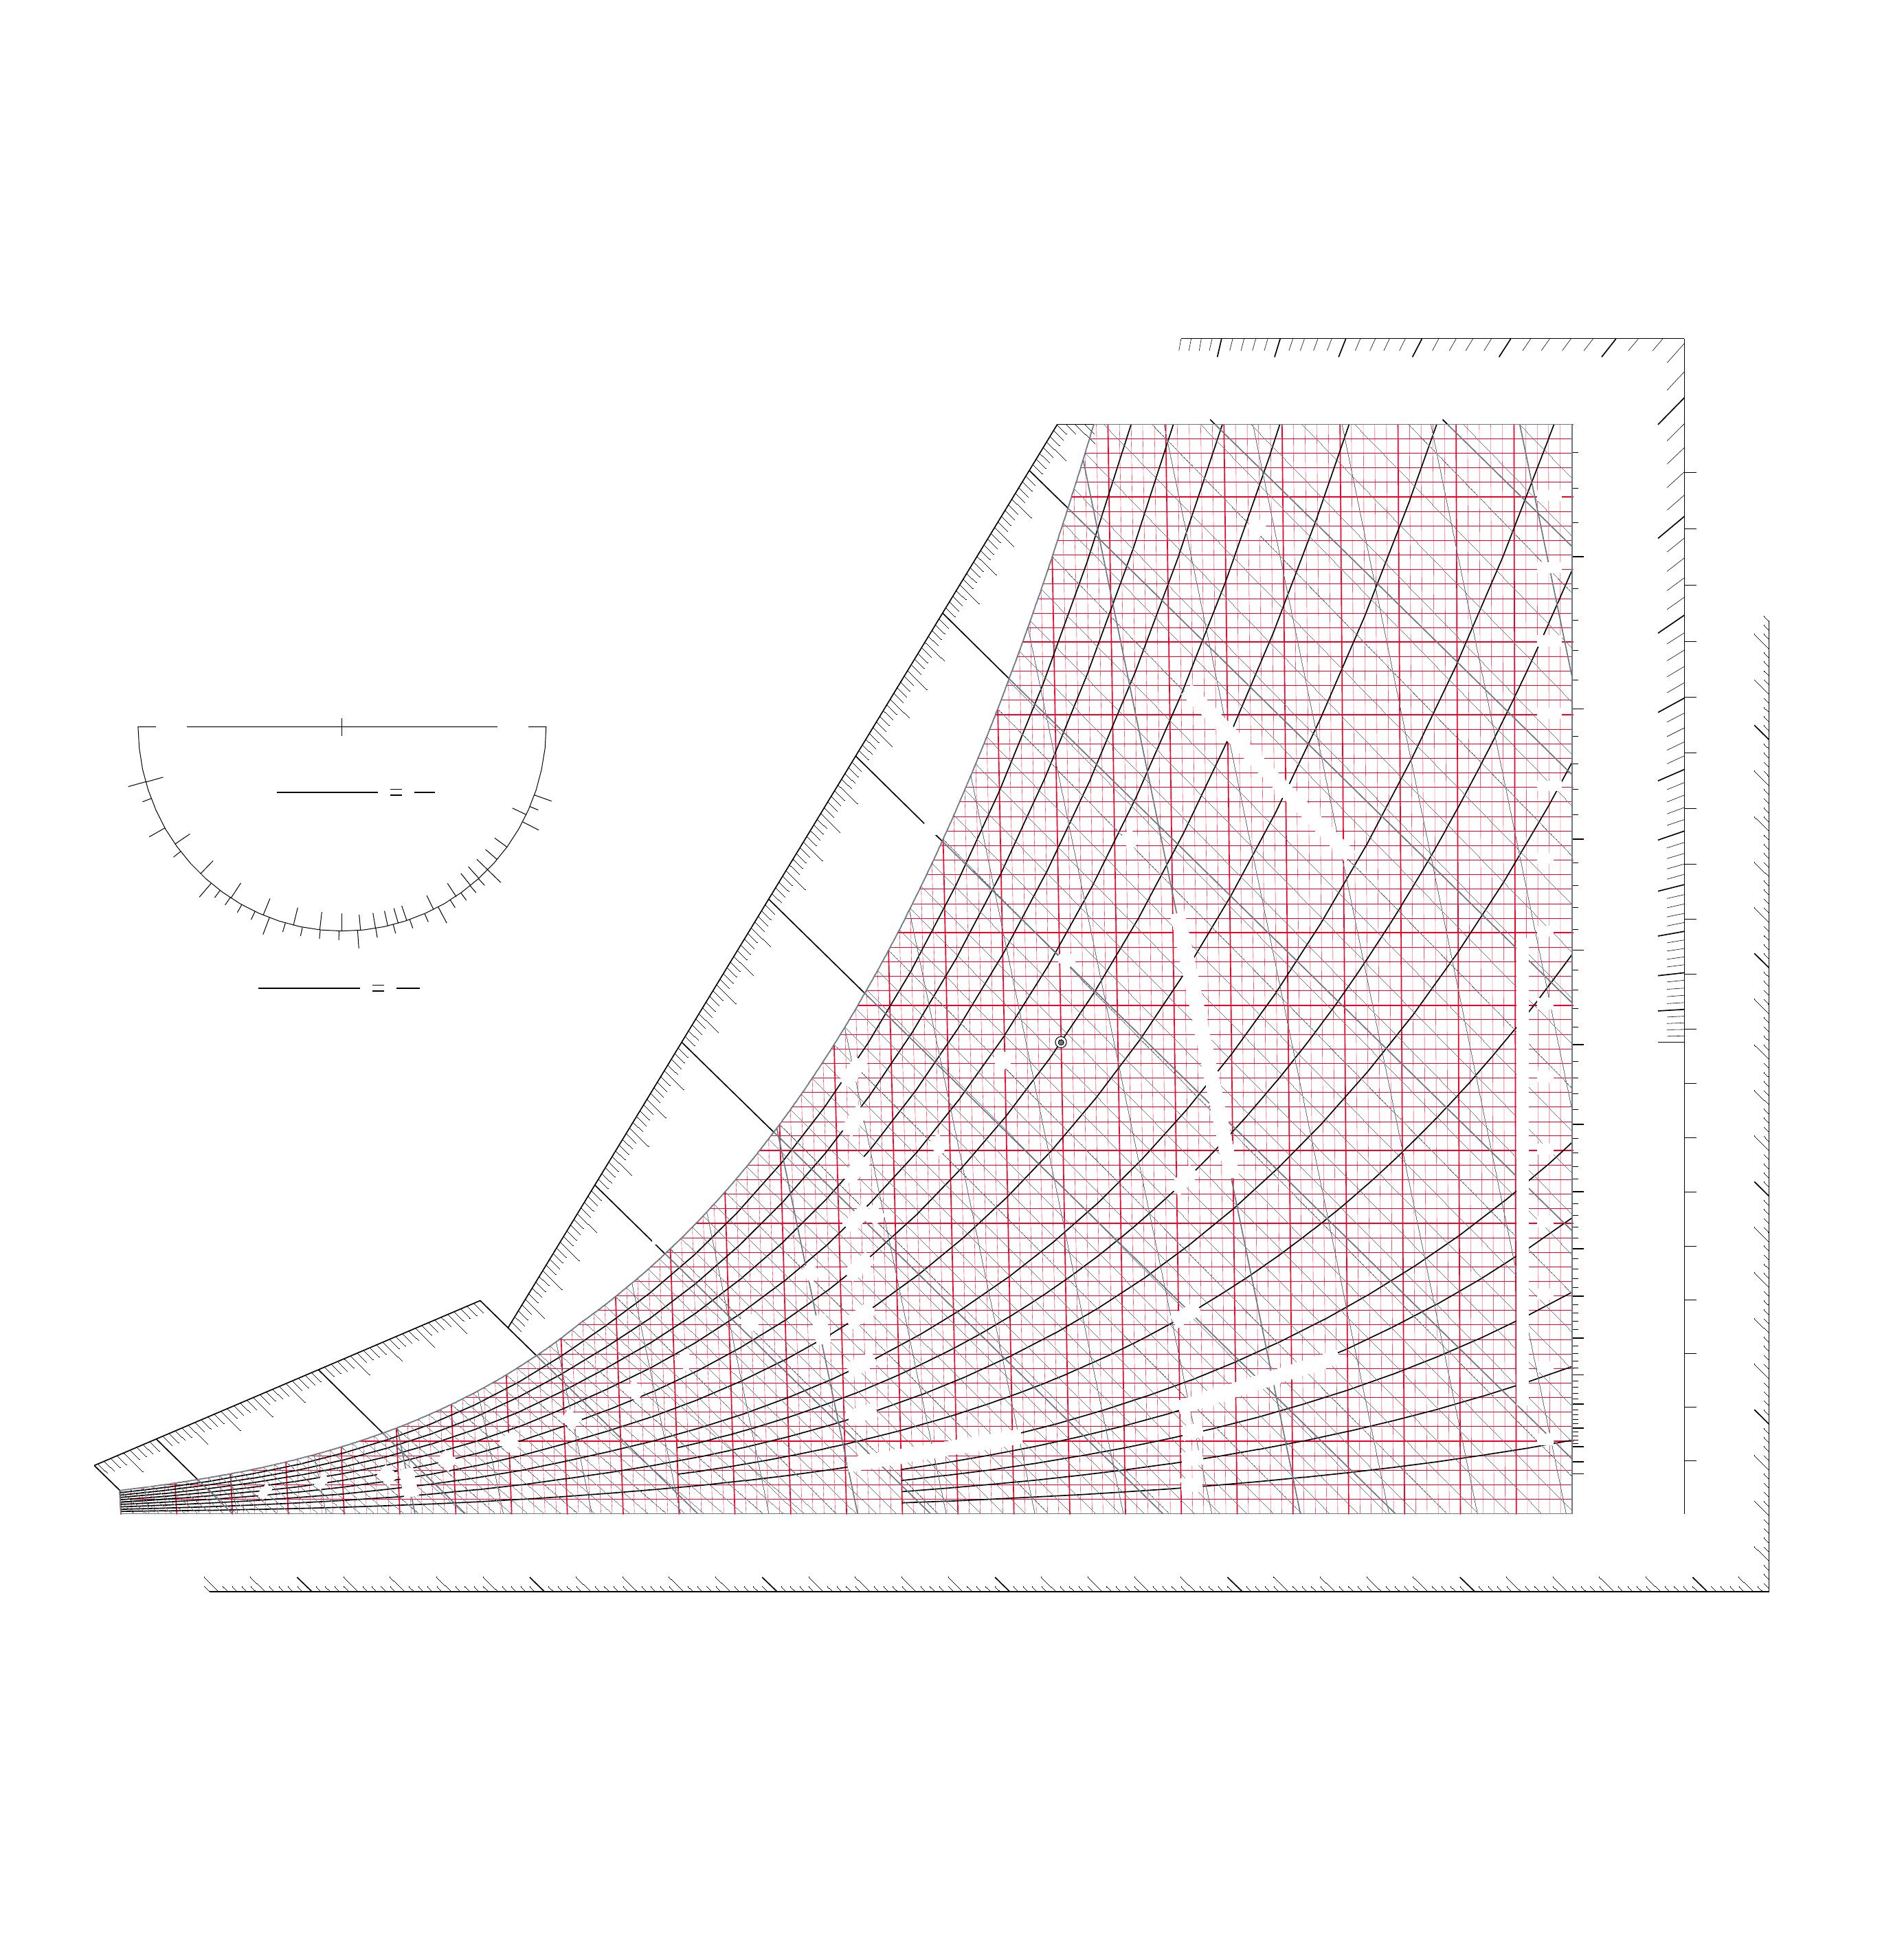 Basic Psychrometric Chart Free Download - Printable Psychrometric Chart Free